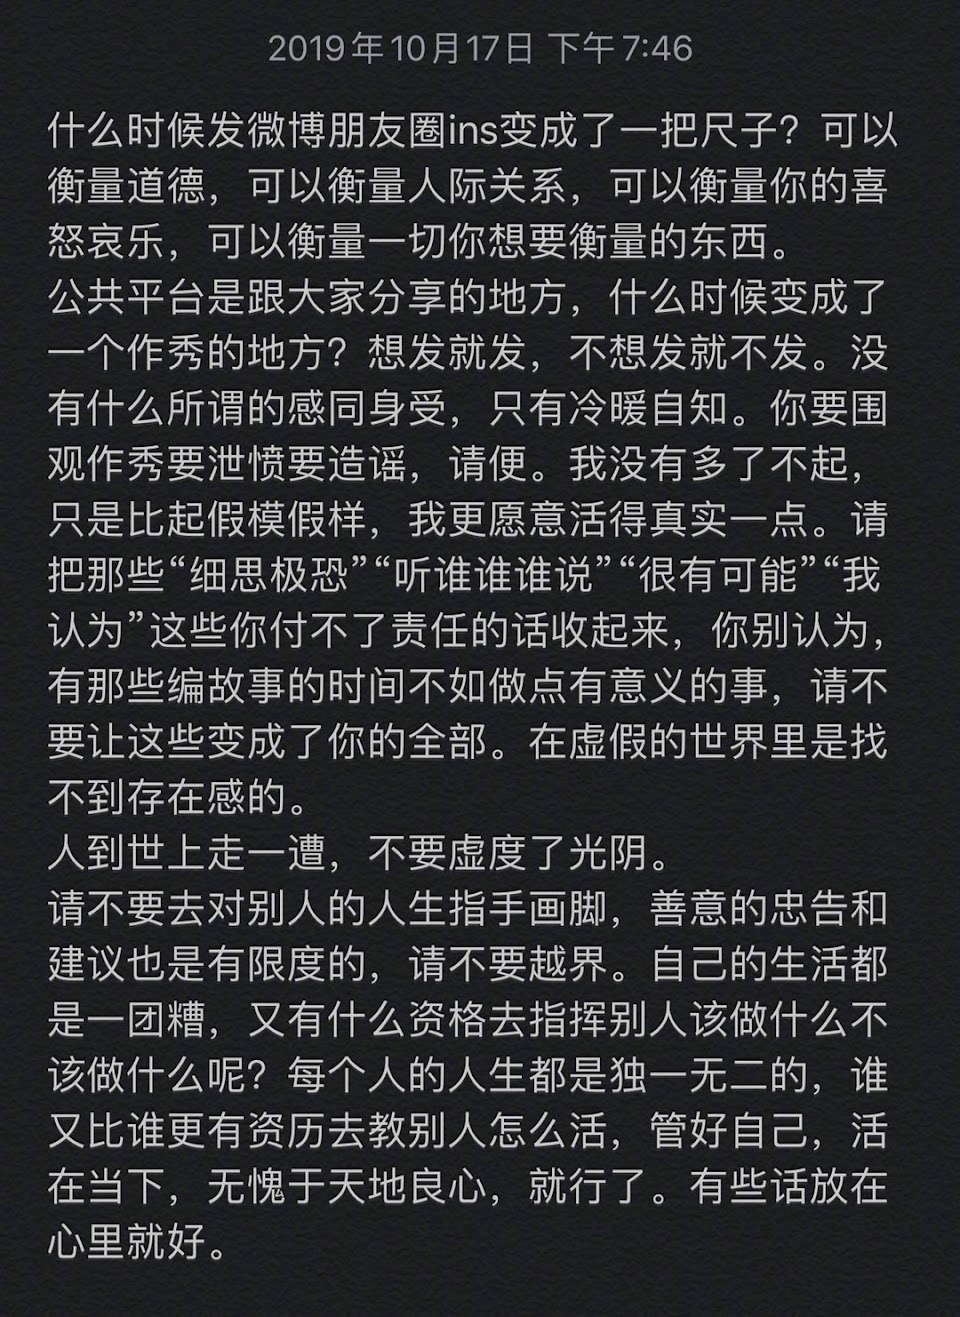 victoria-weibo-post